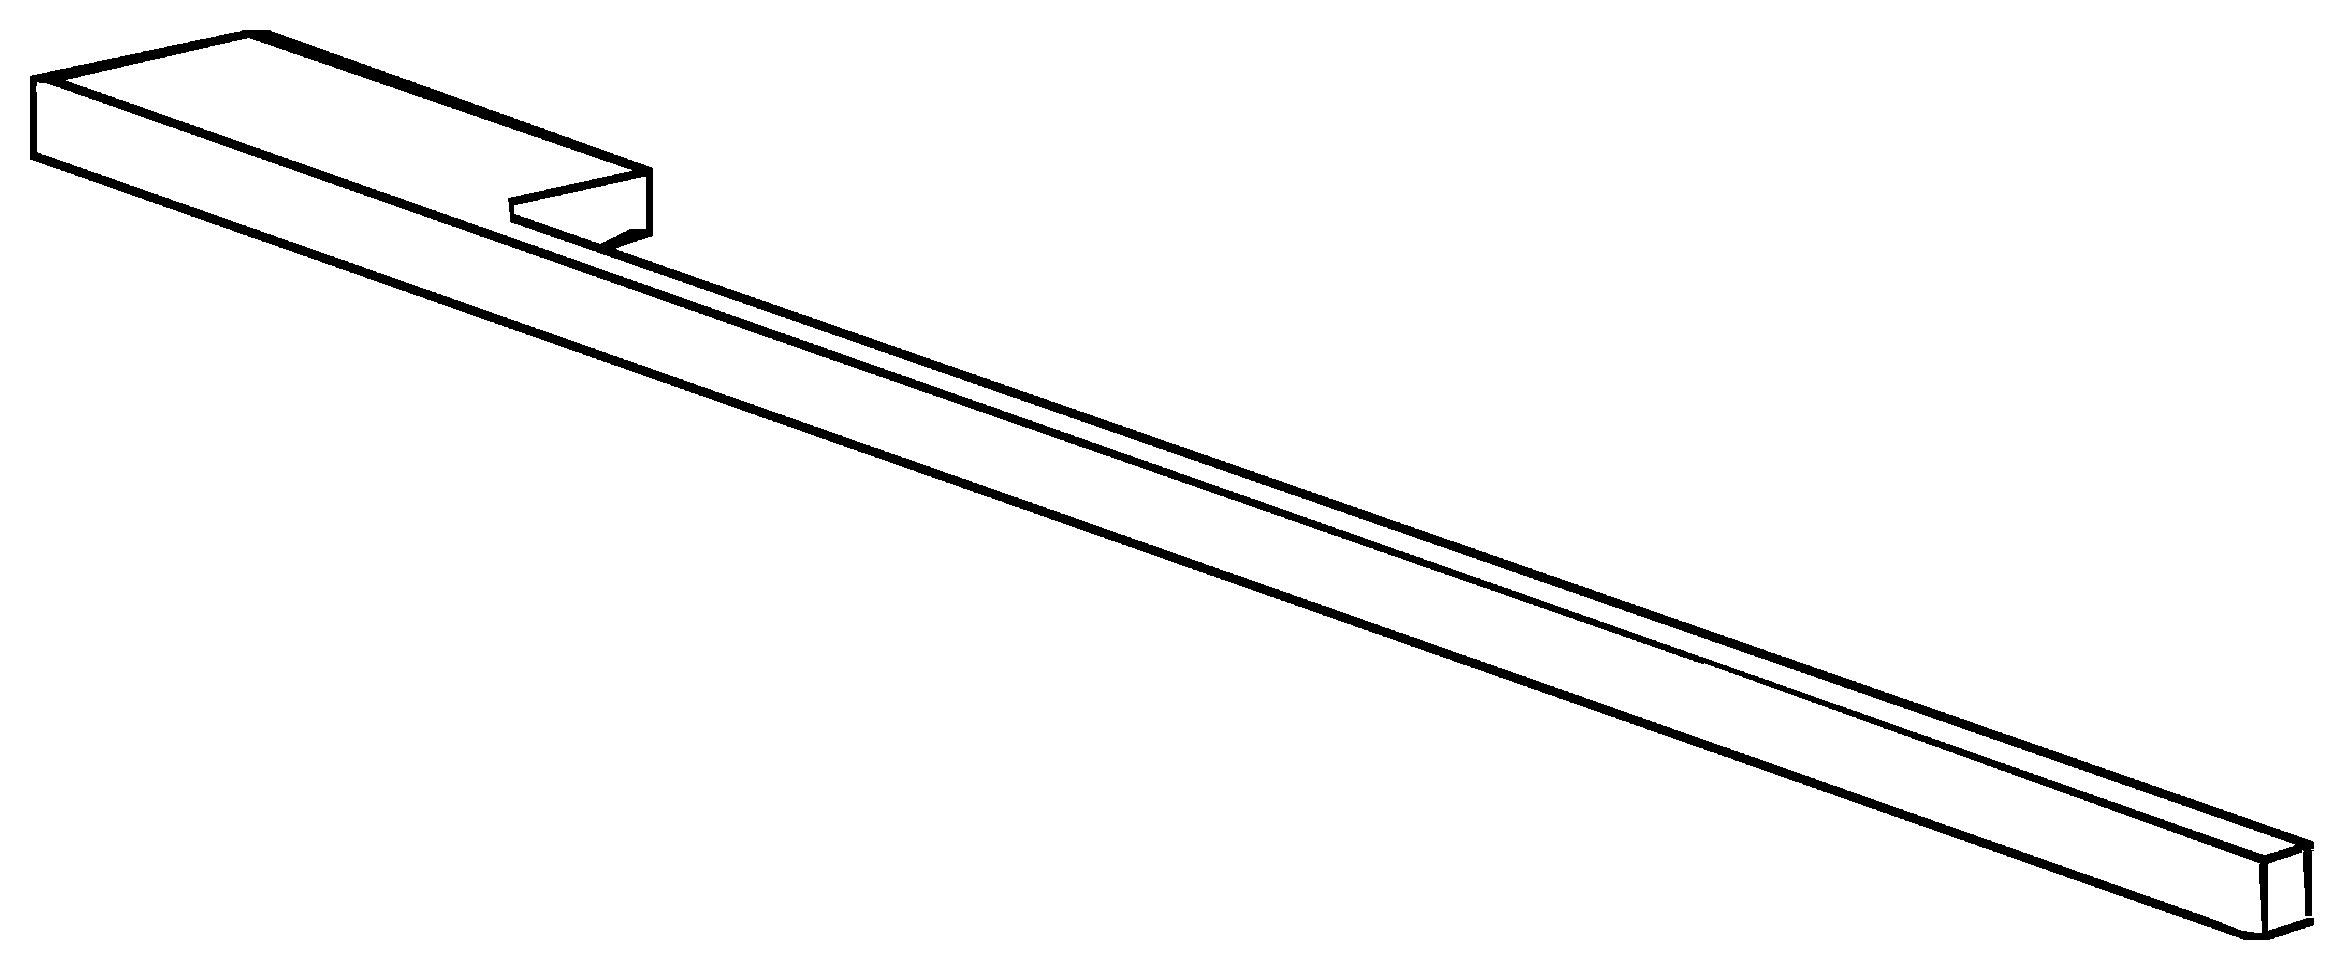 Keramag Geberit Handtuchhalter 400x10x40mm quadratisch